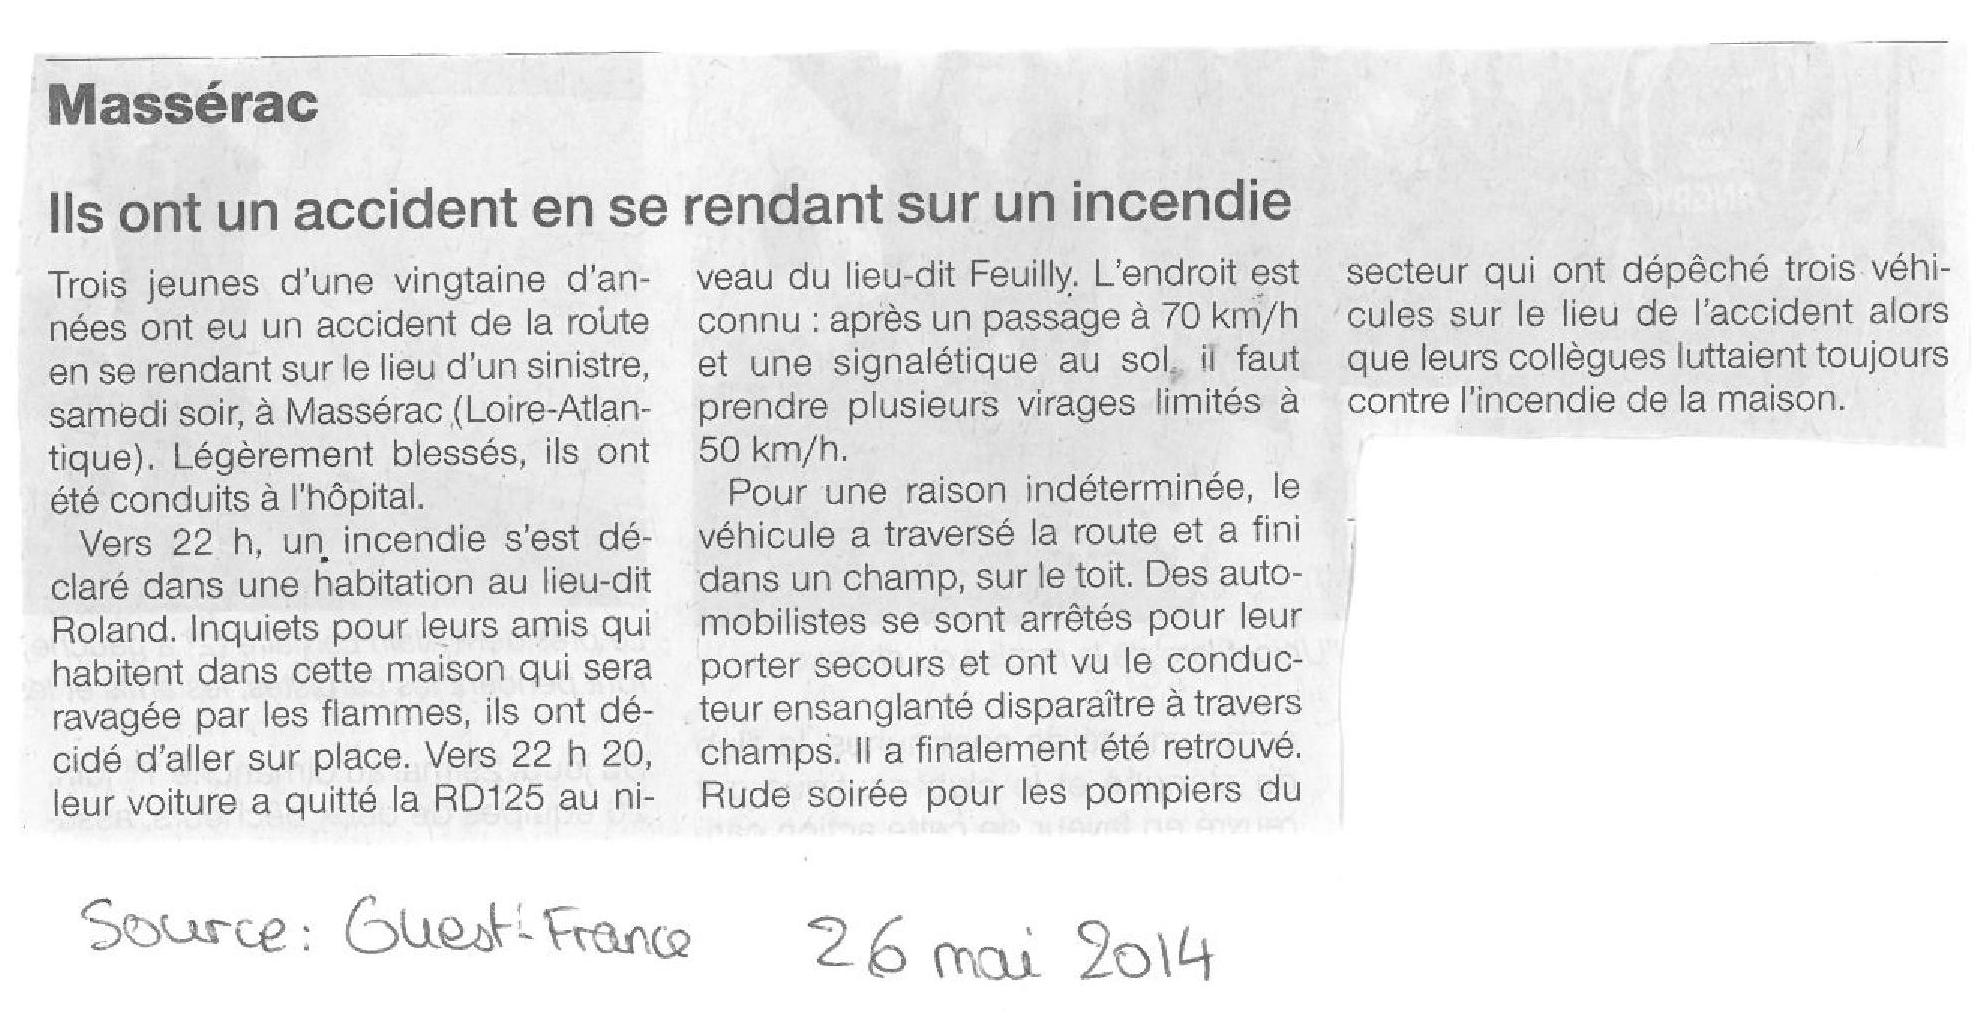 ouest-france-26-juin-2014-page-001